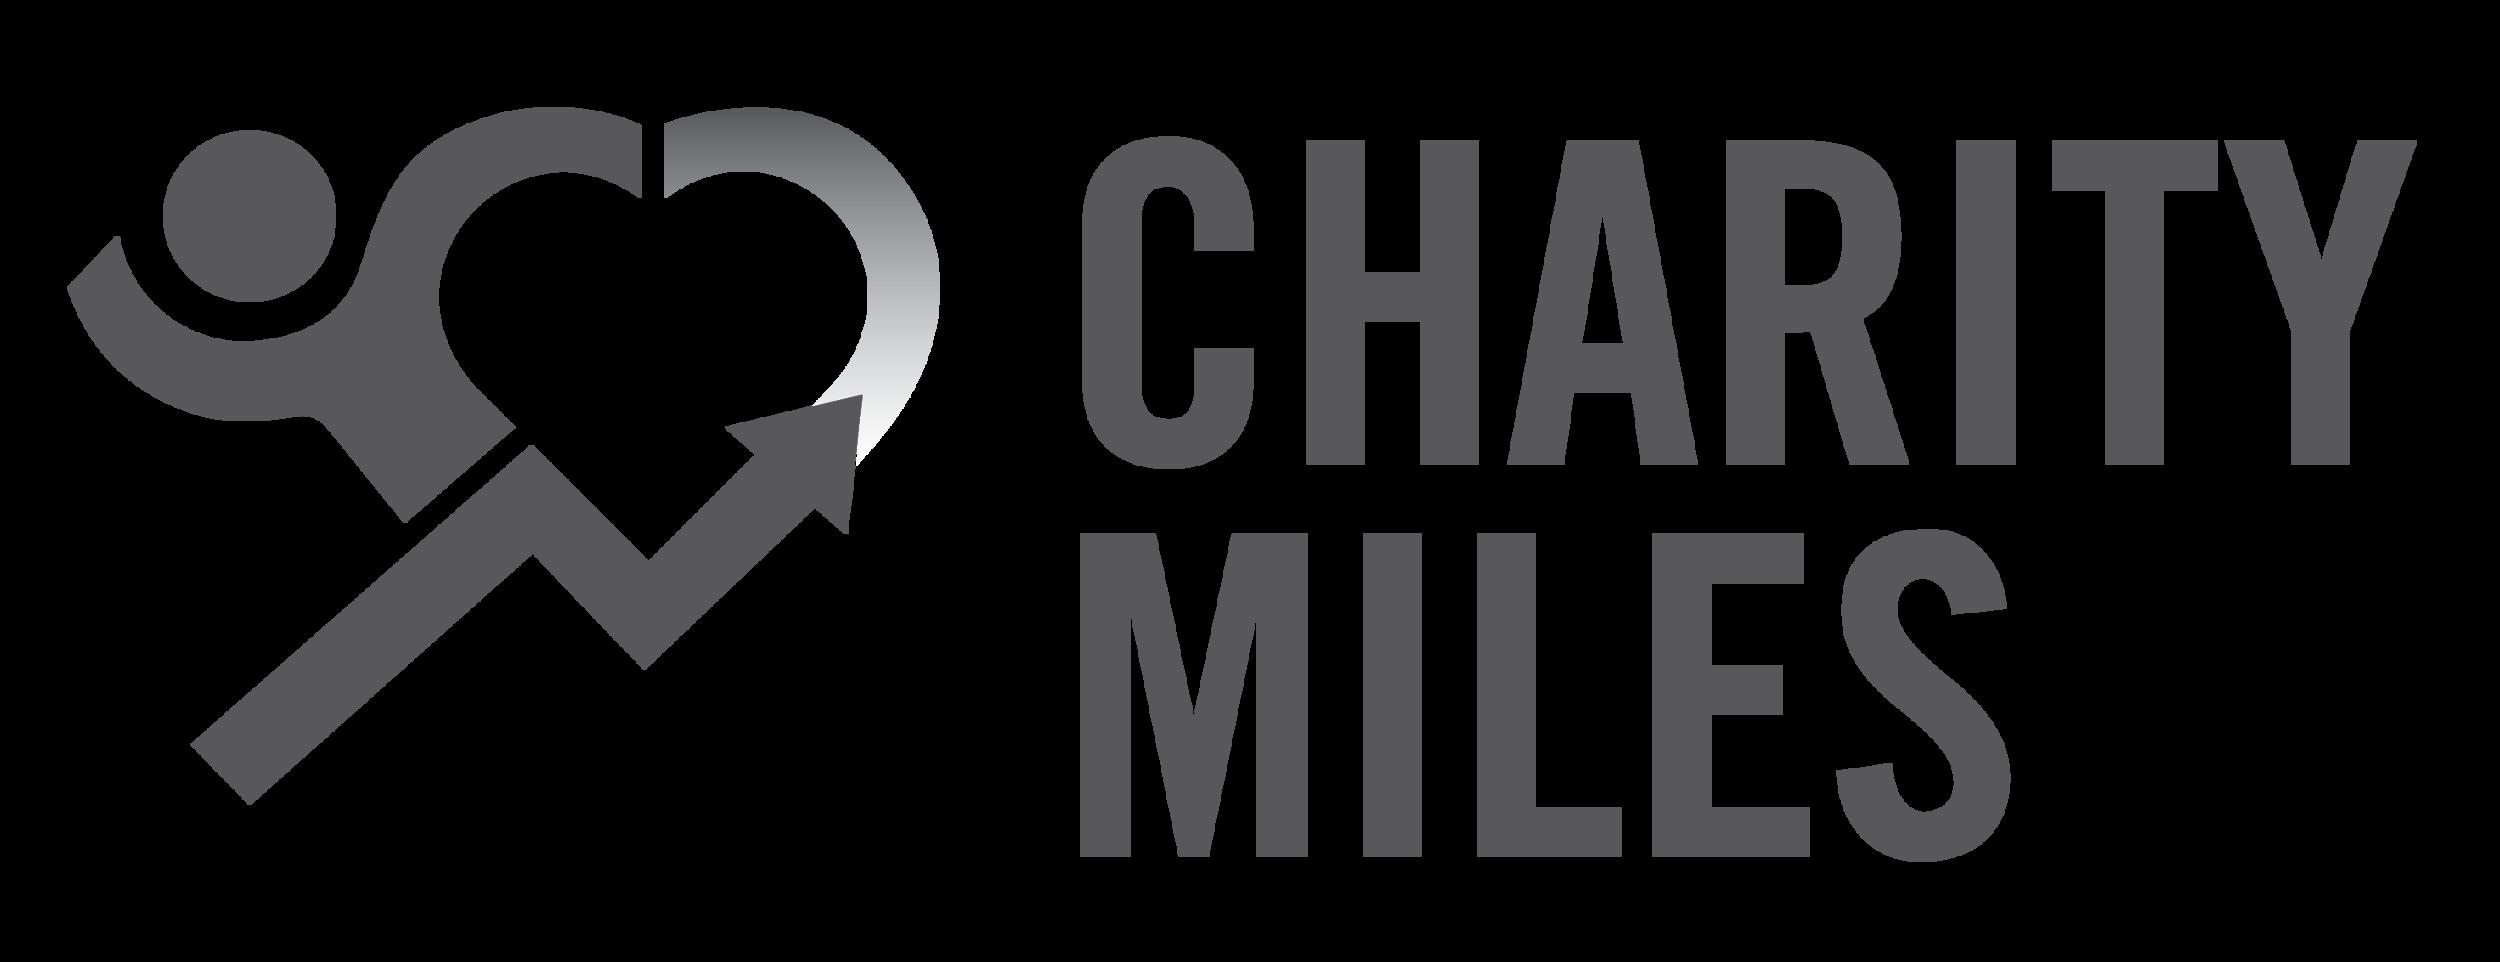 PC: charitymiles.org